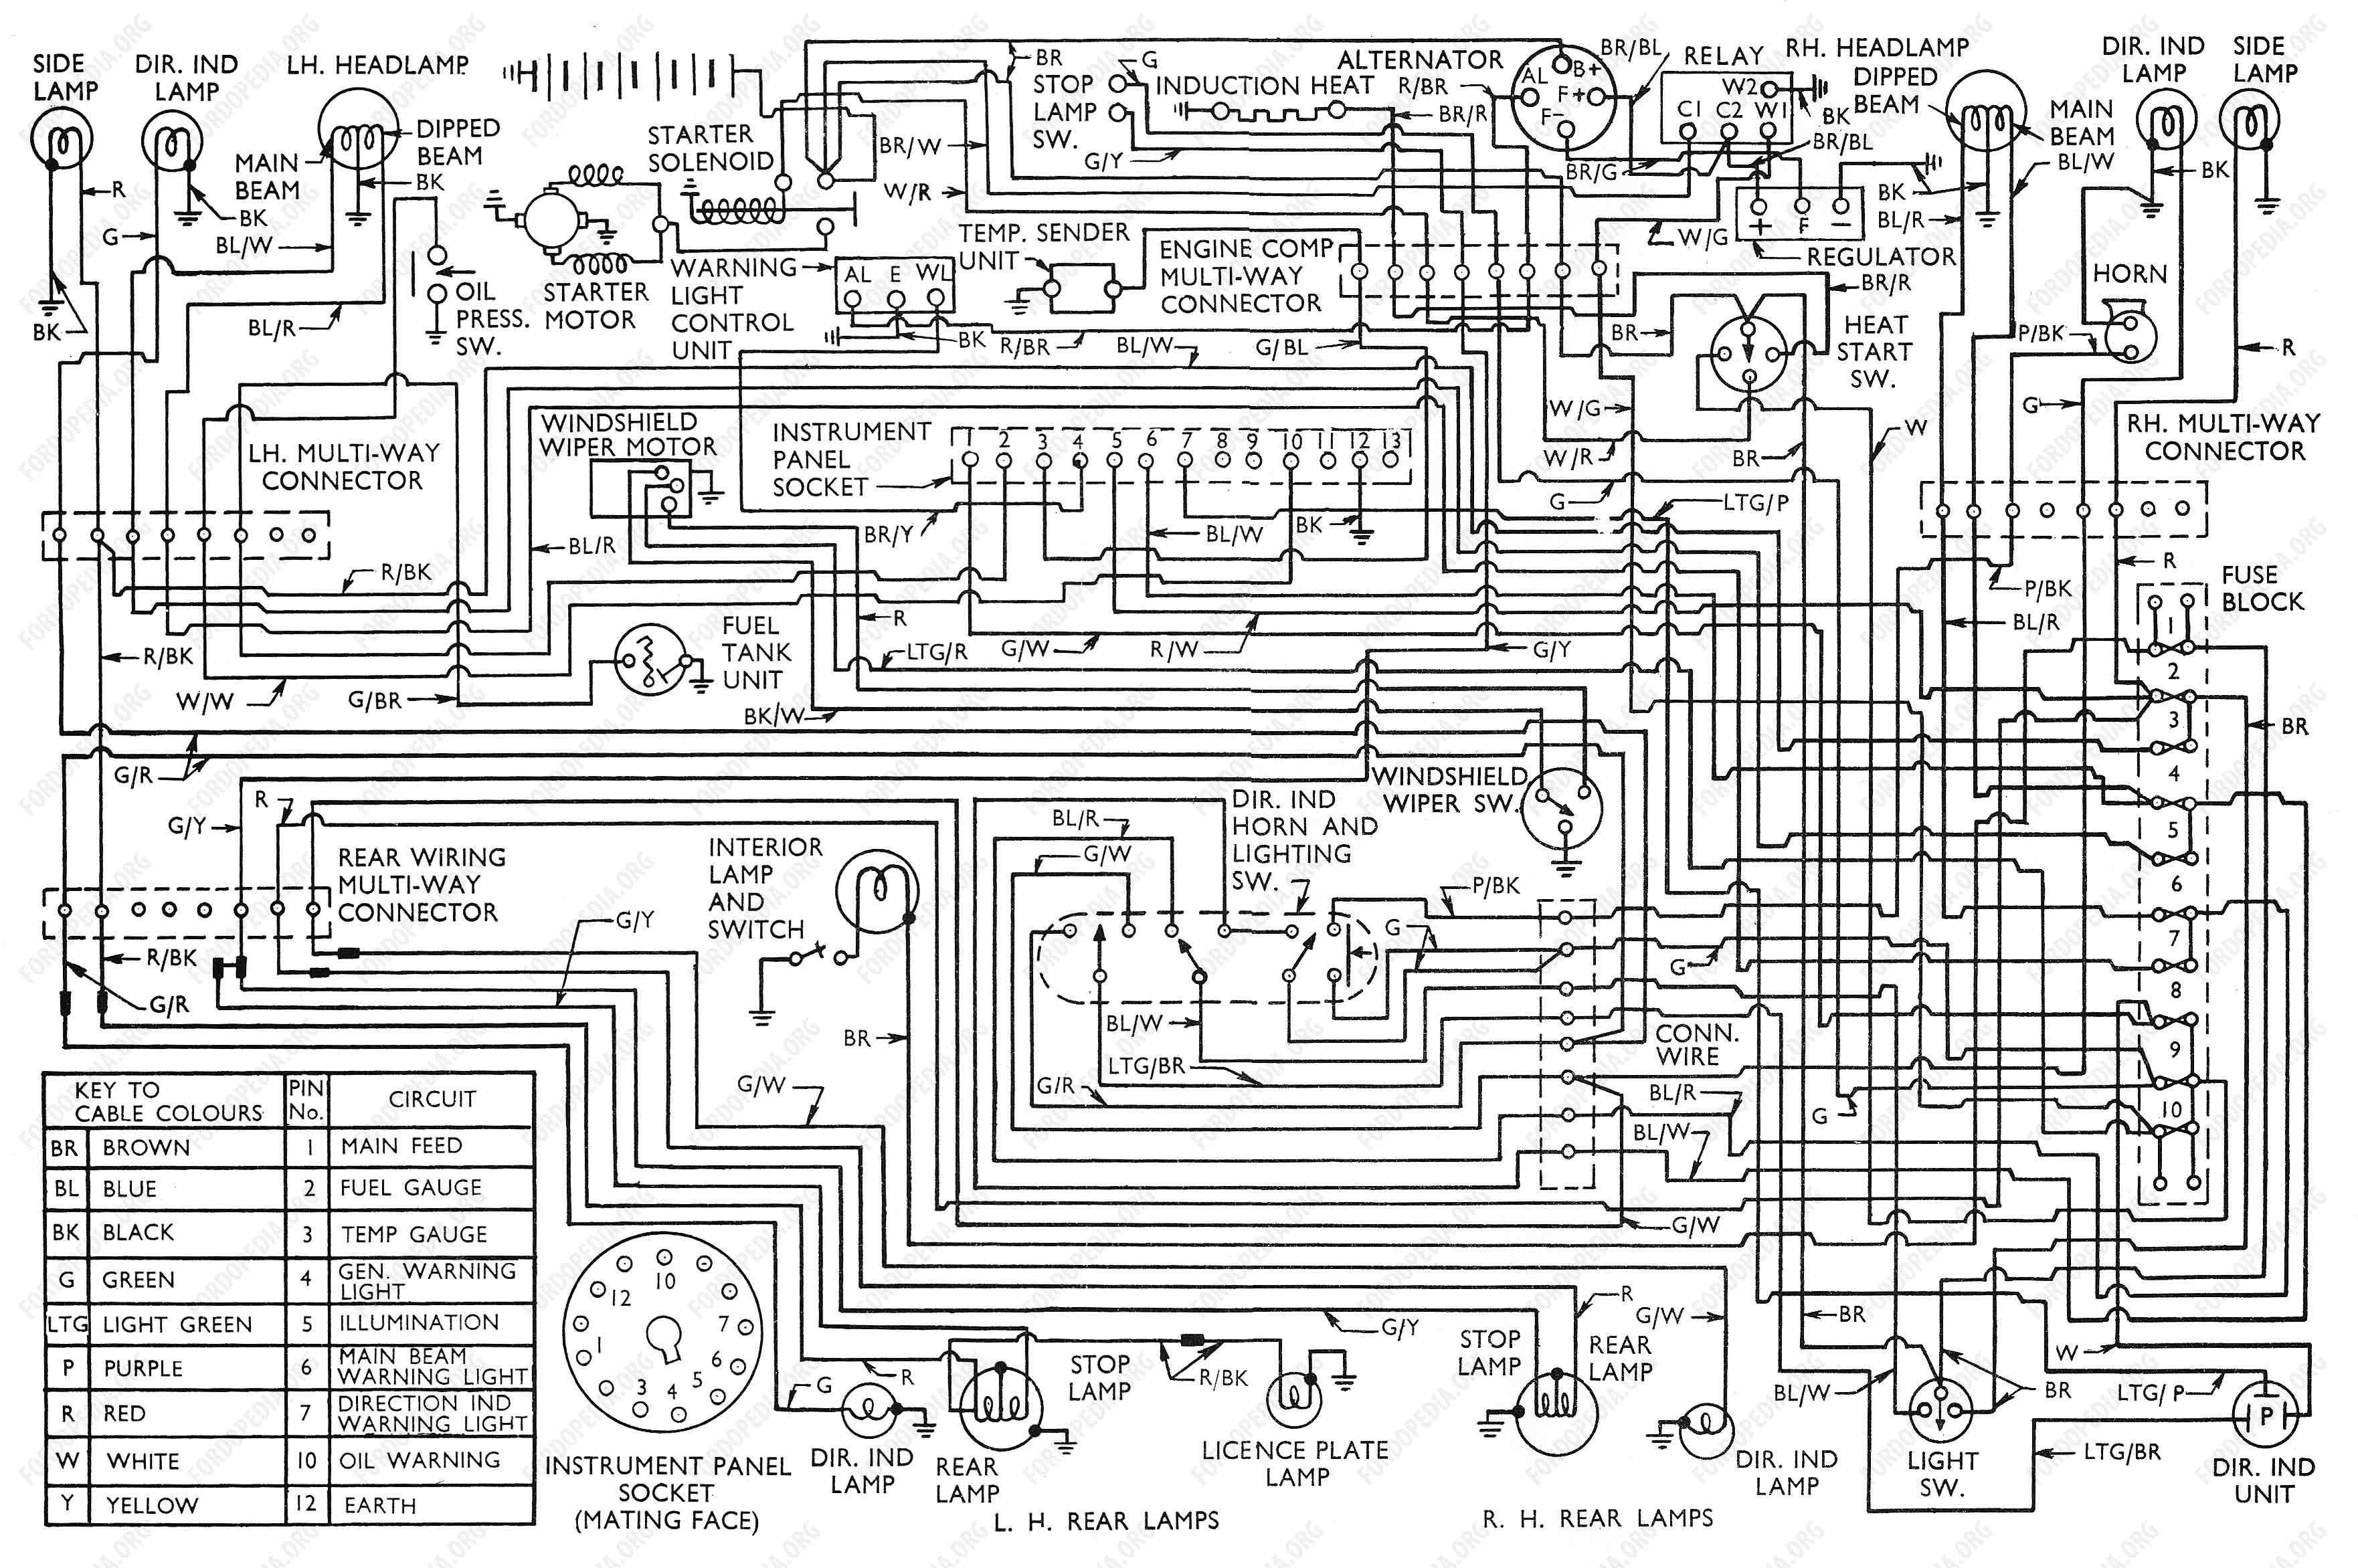 Ford Transit Fuse Diagram Wiring Diagram Home